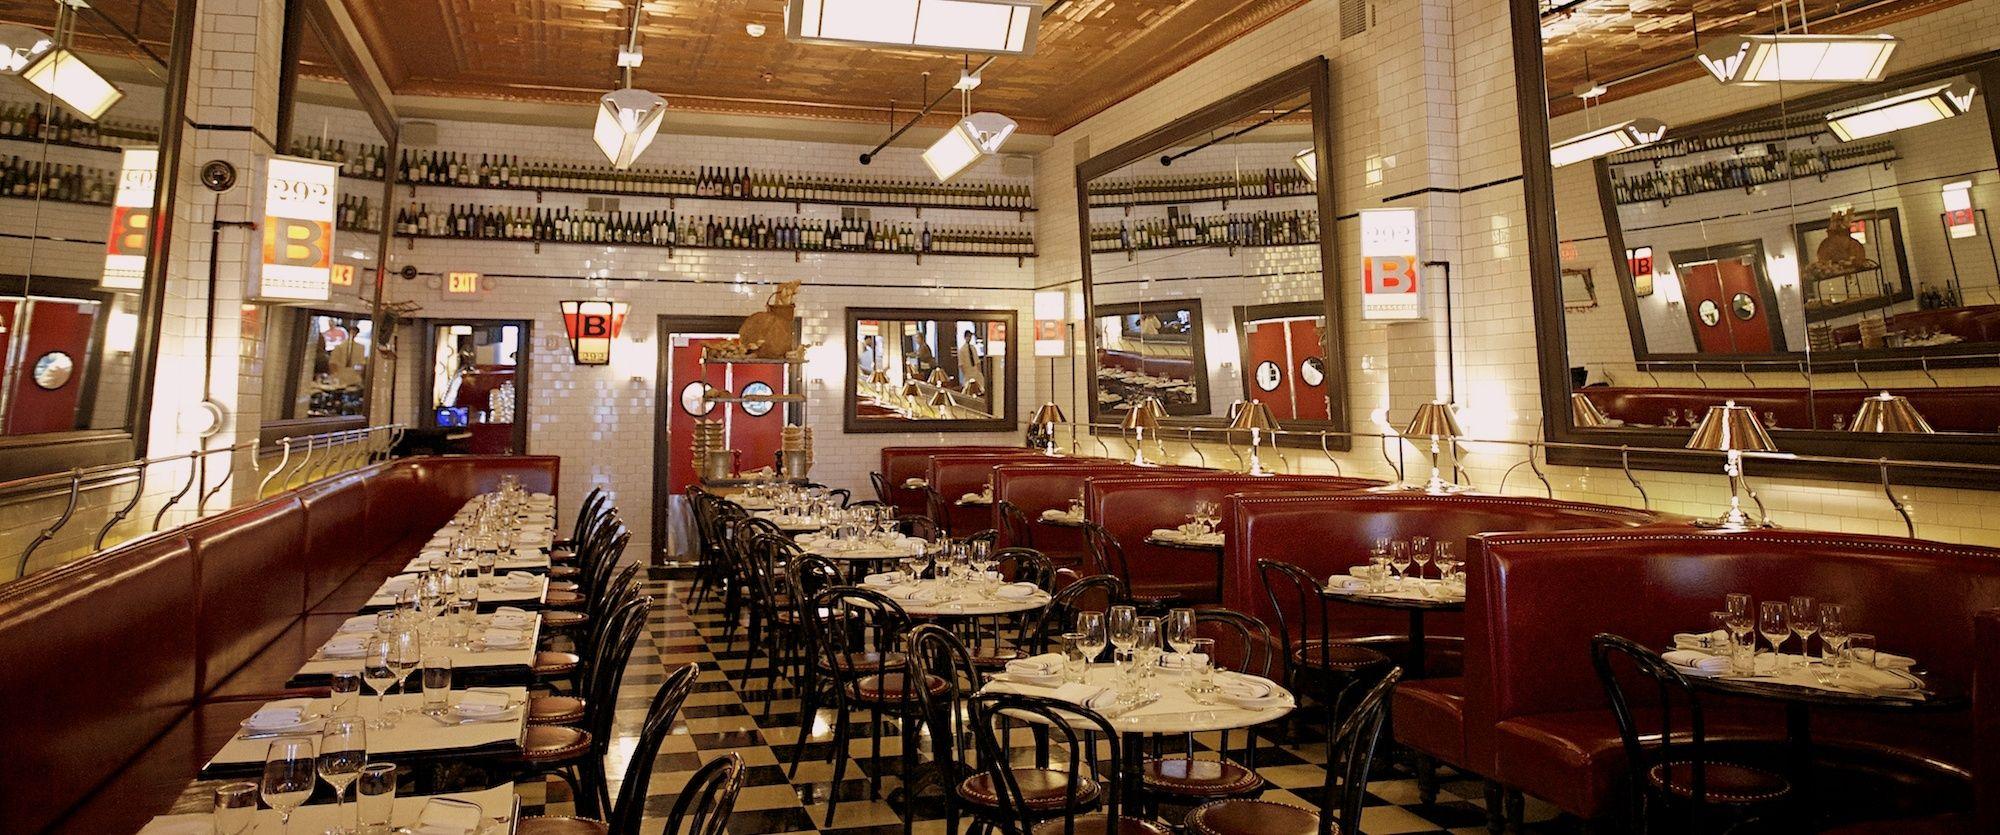 Brasserie 292 Poughkeepsie Ny Hudson Valley Compass